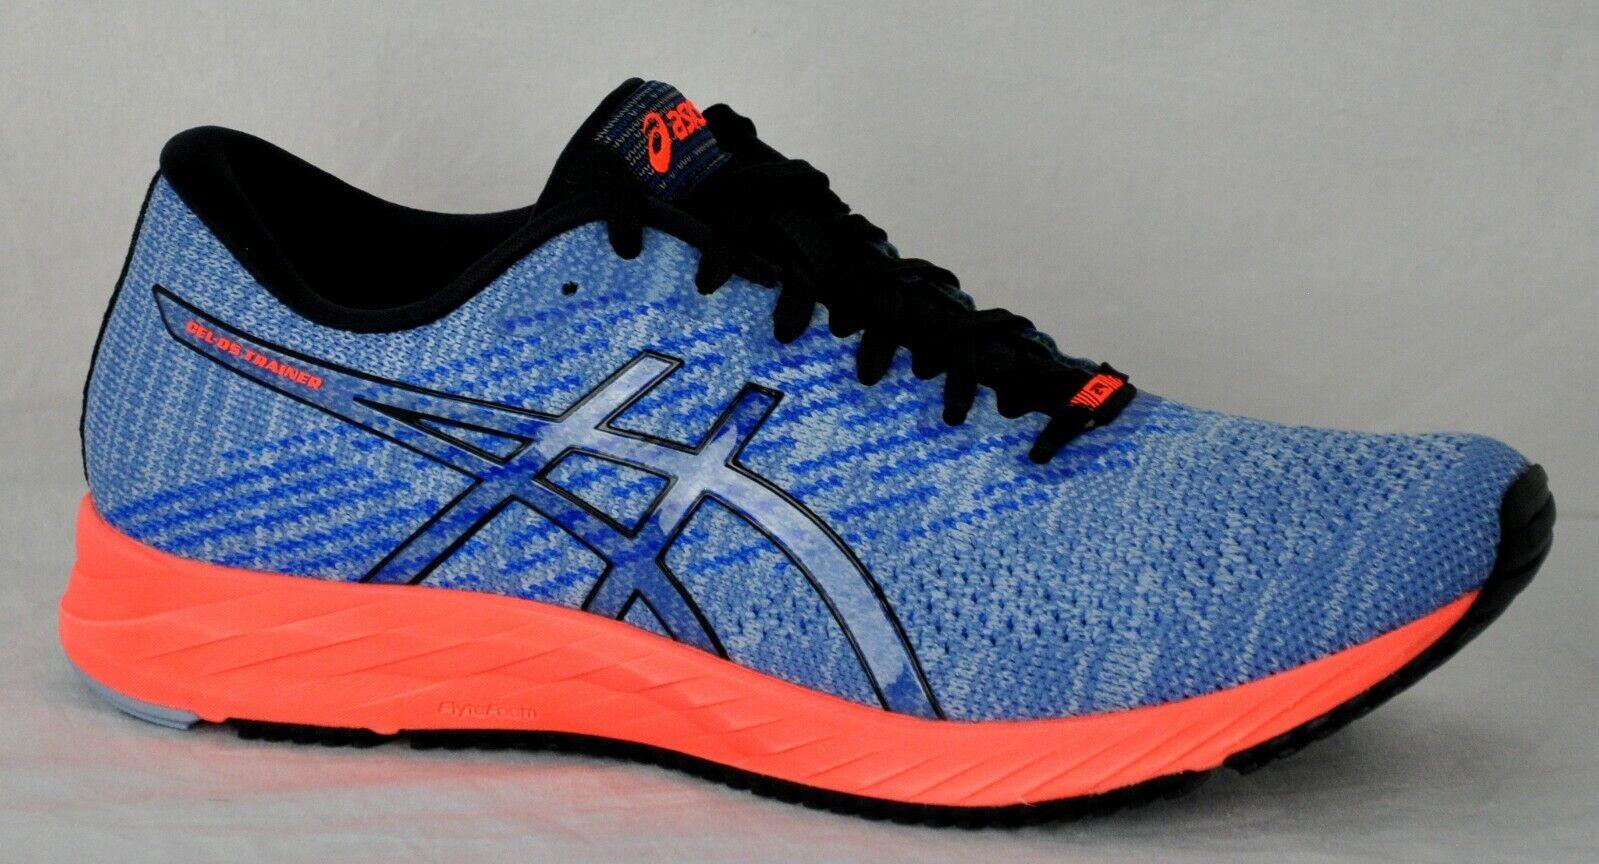 Asics Women's Gel-DS Trainer 24 Running Running Running shoes 1012A158 Mist Ilusn bluee Size 10.5 12c71c